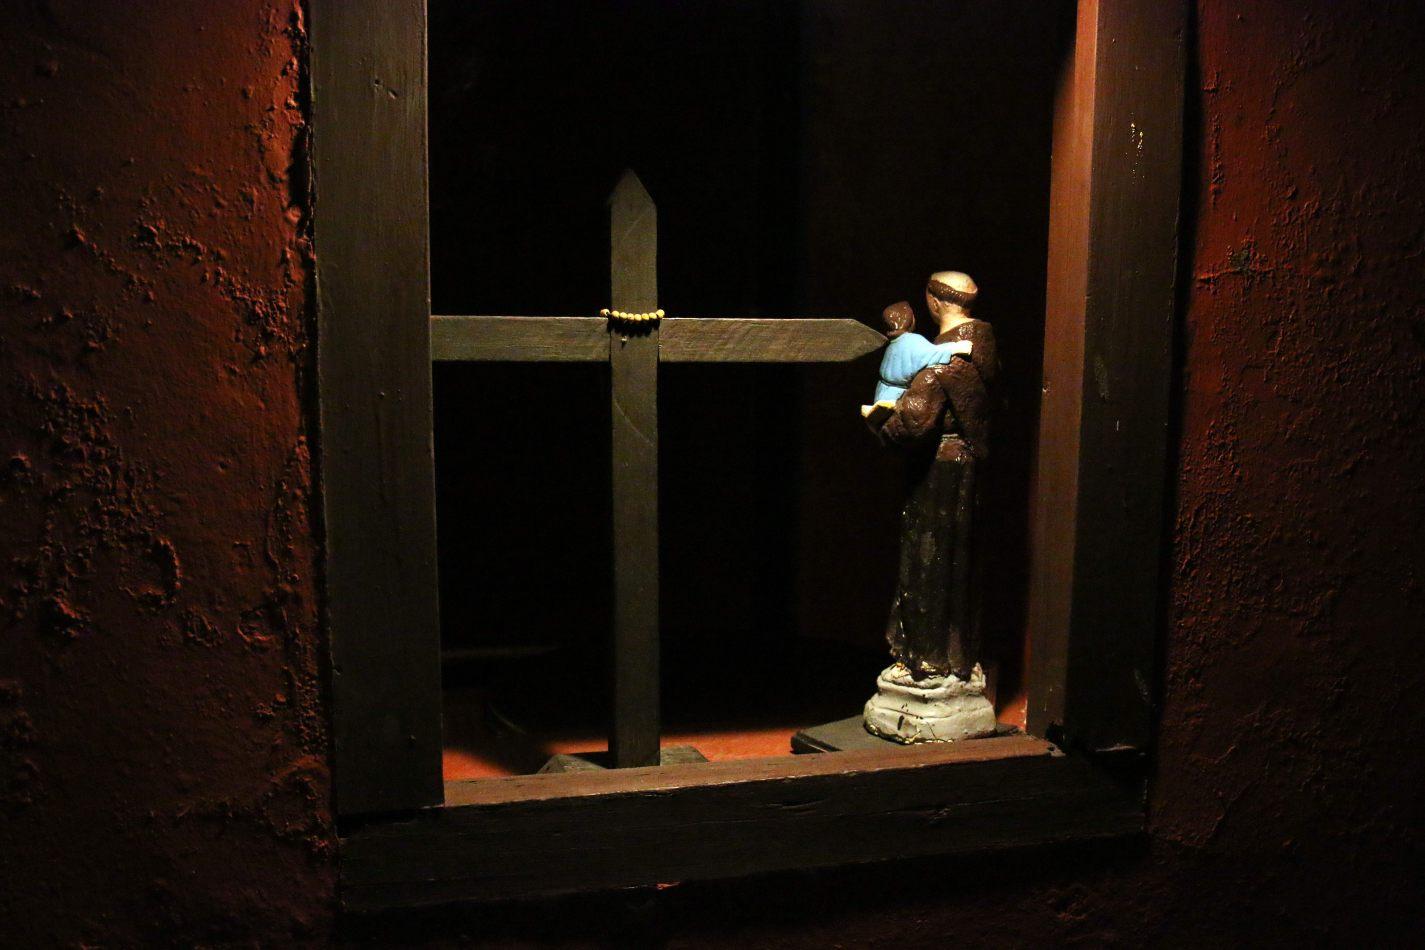 Anthony Ellis Photography: Small Sacrifices - Into the Dark